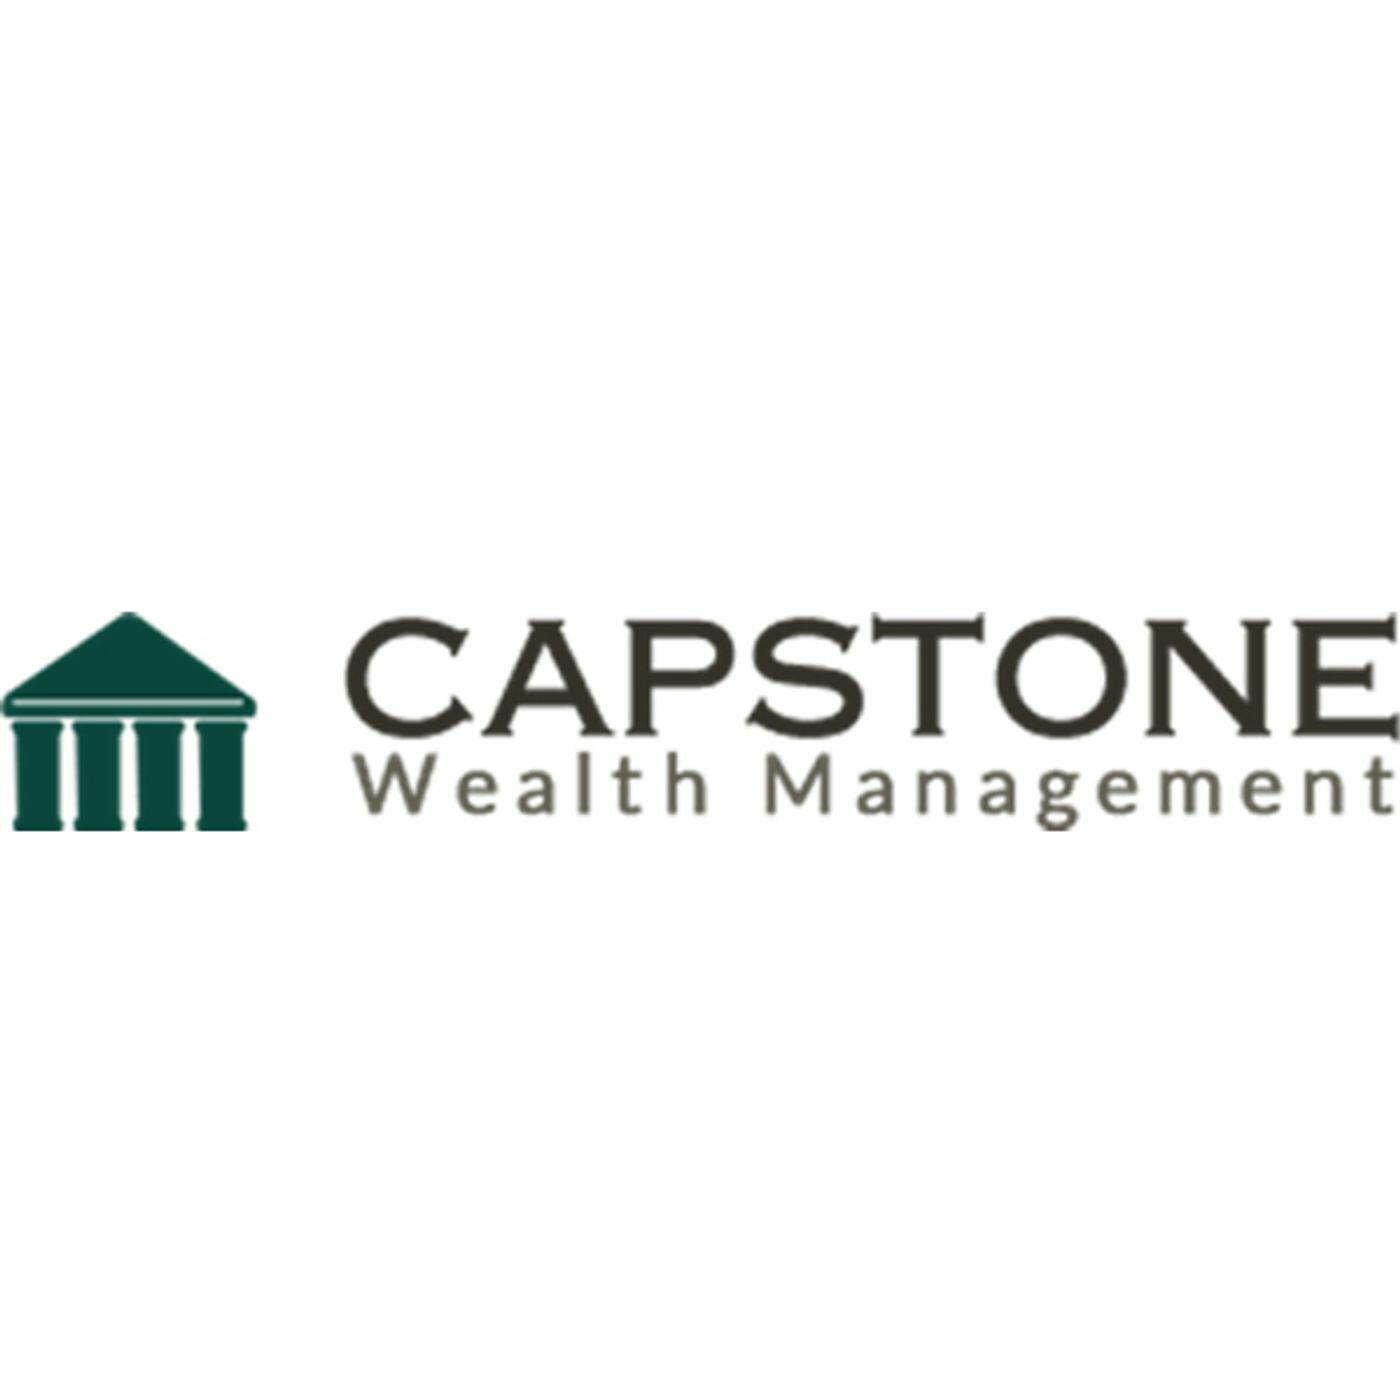 Capstone Wealth Management